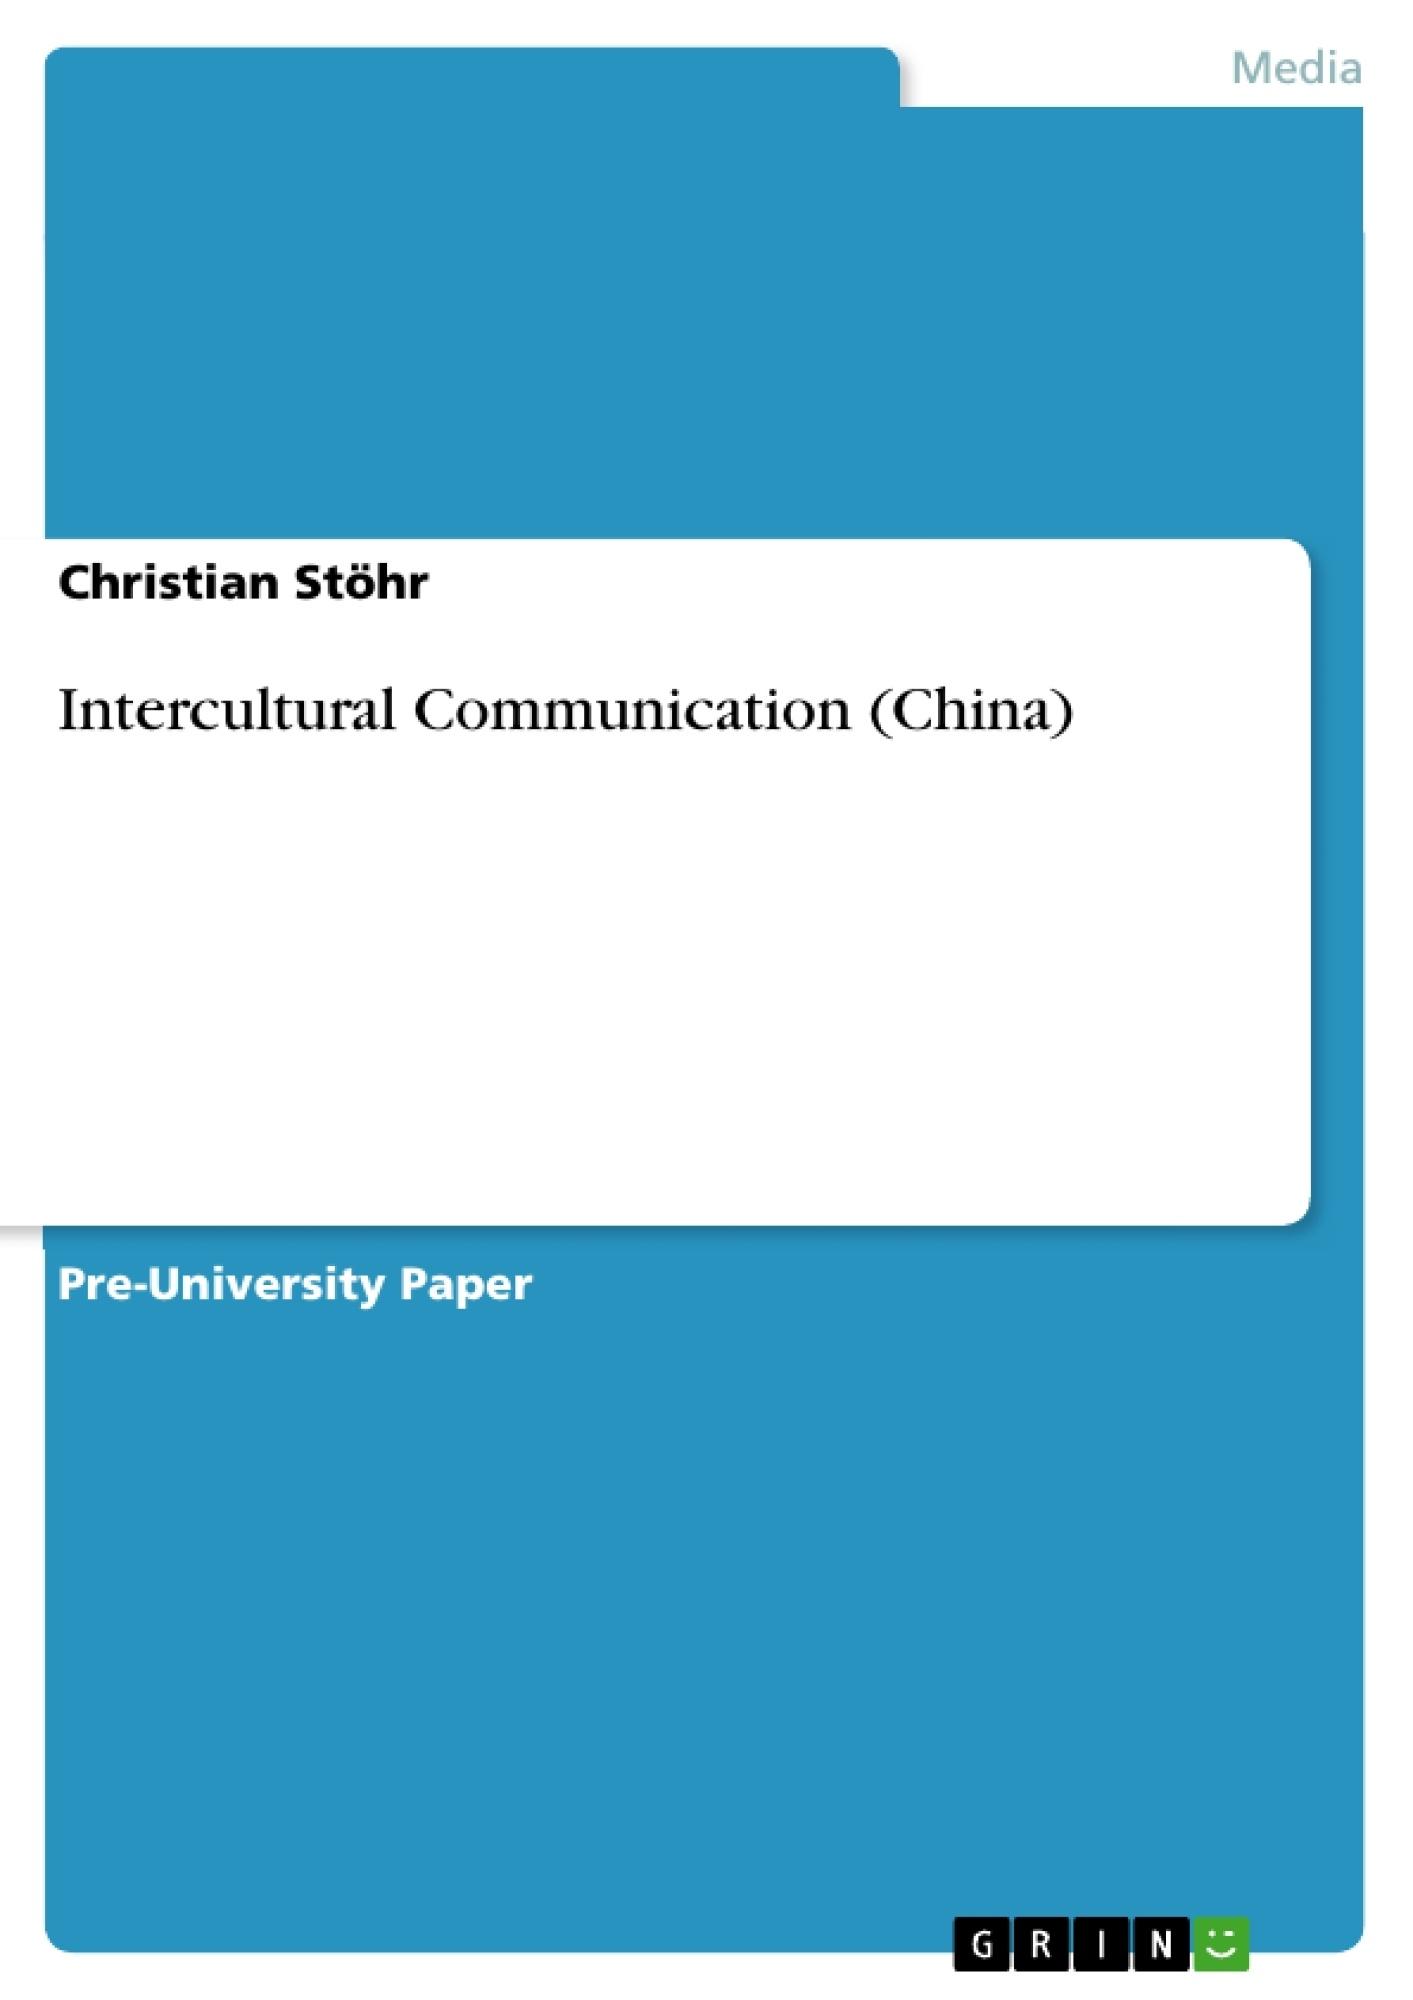 Title: Intercultural Communication (China)